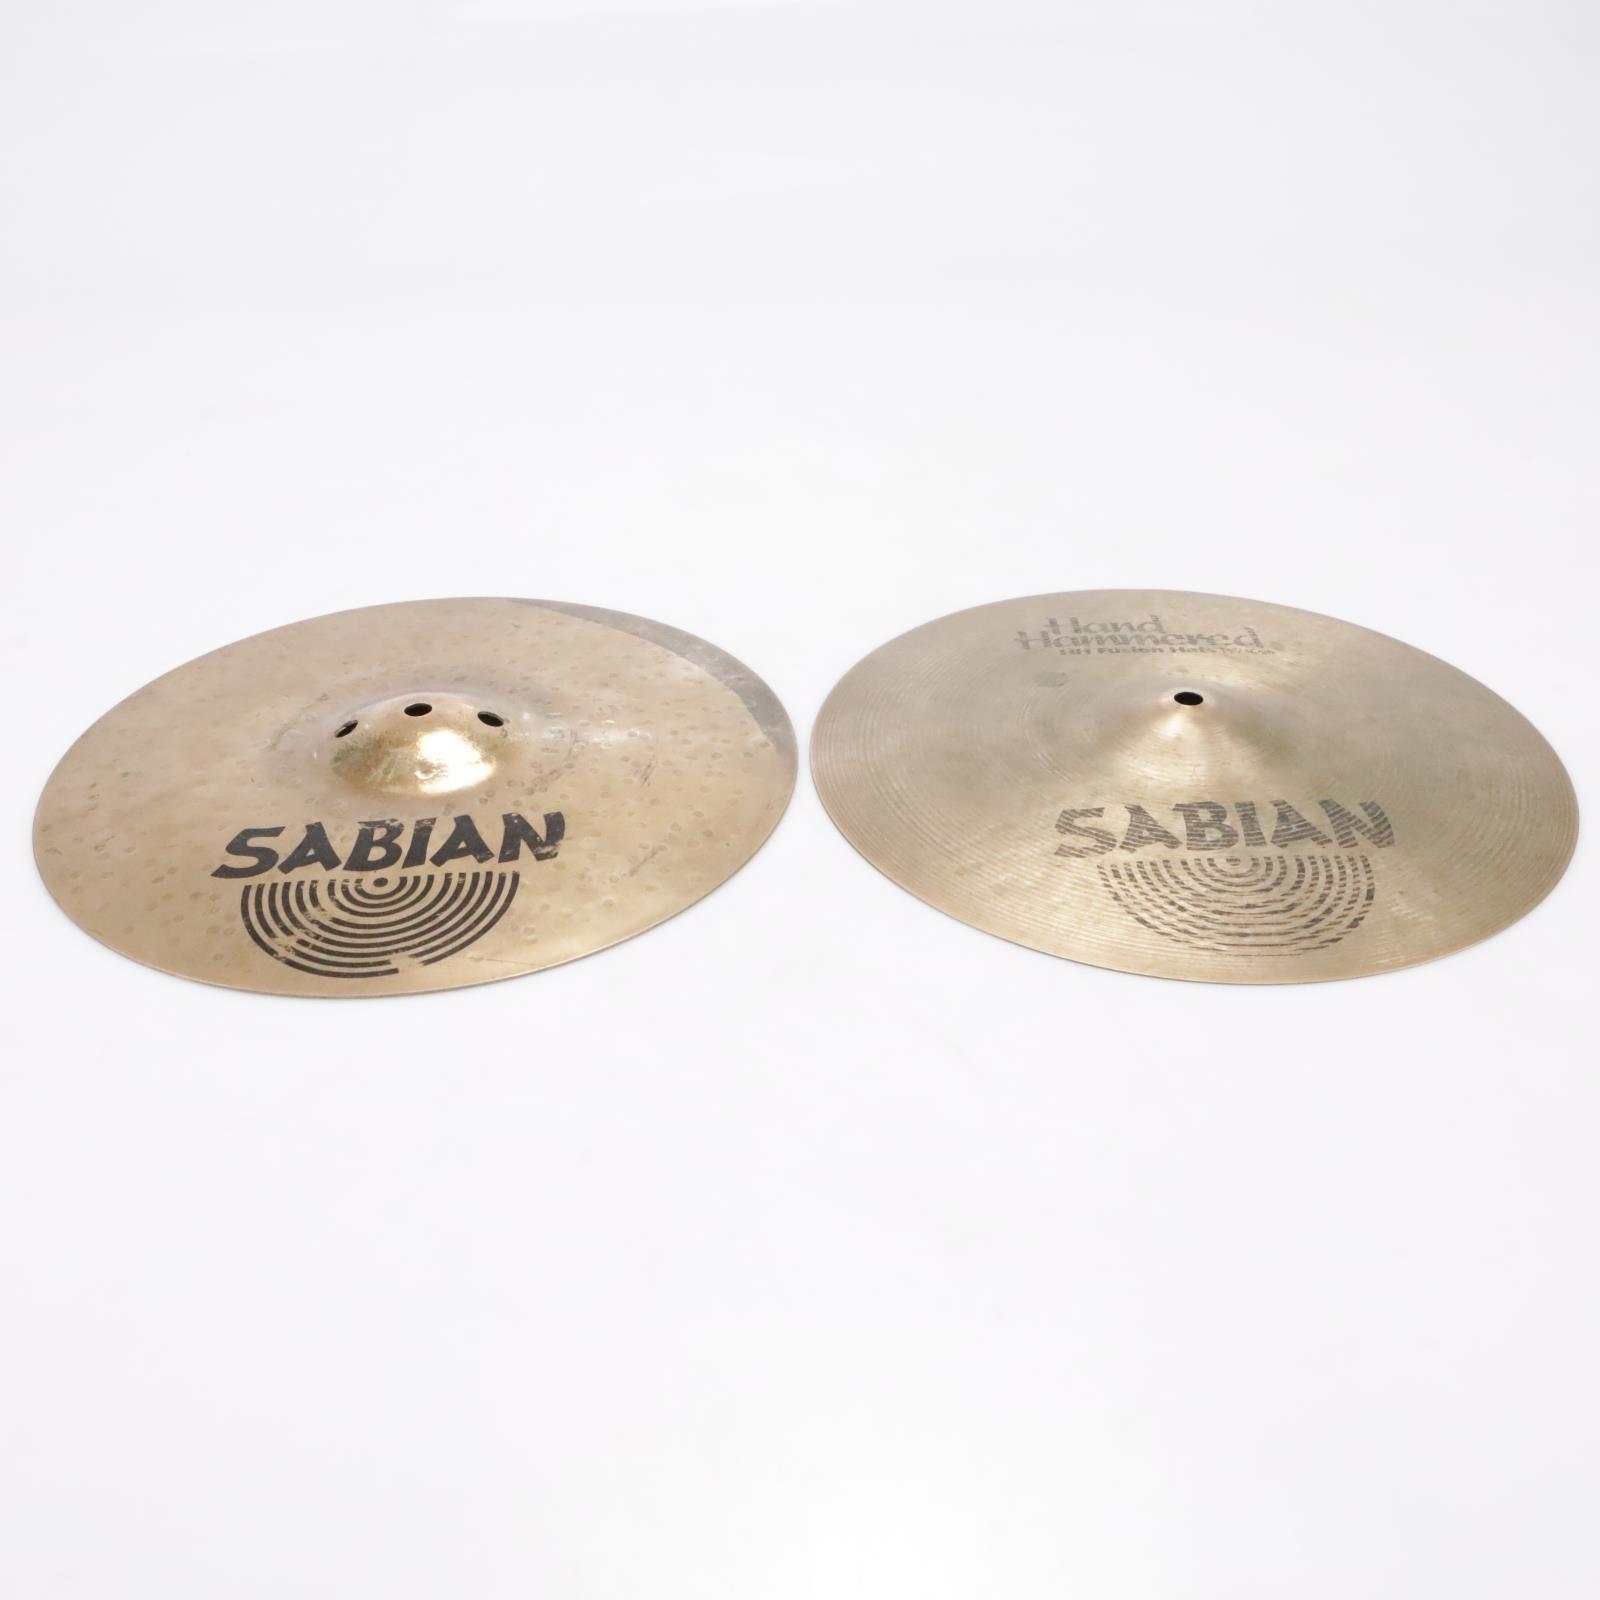 "Sabian Hand Hammered HH Fusion Hi-Hats 14""/36cm Cymbals #42795"